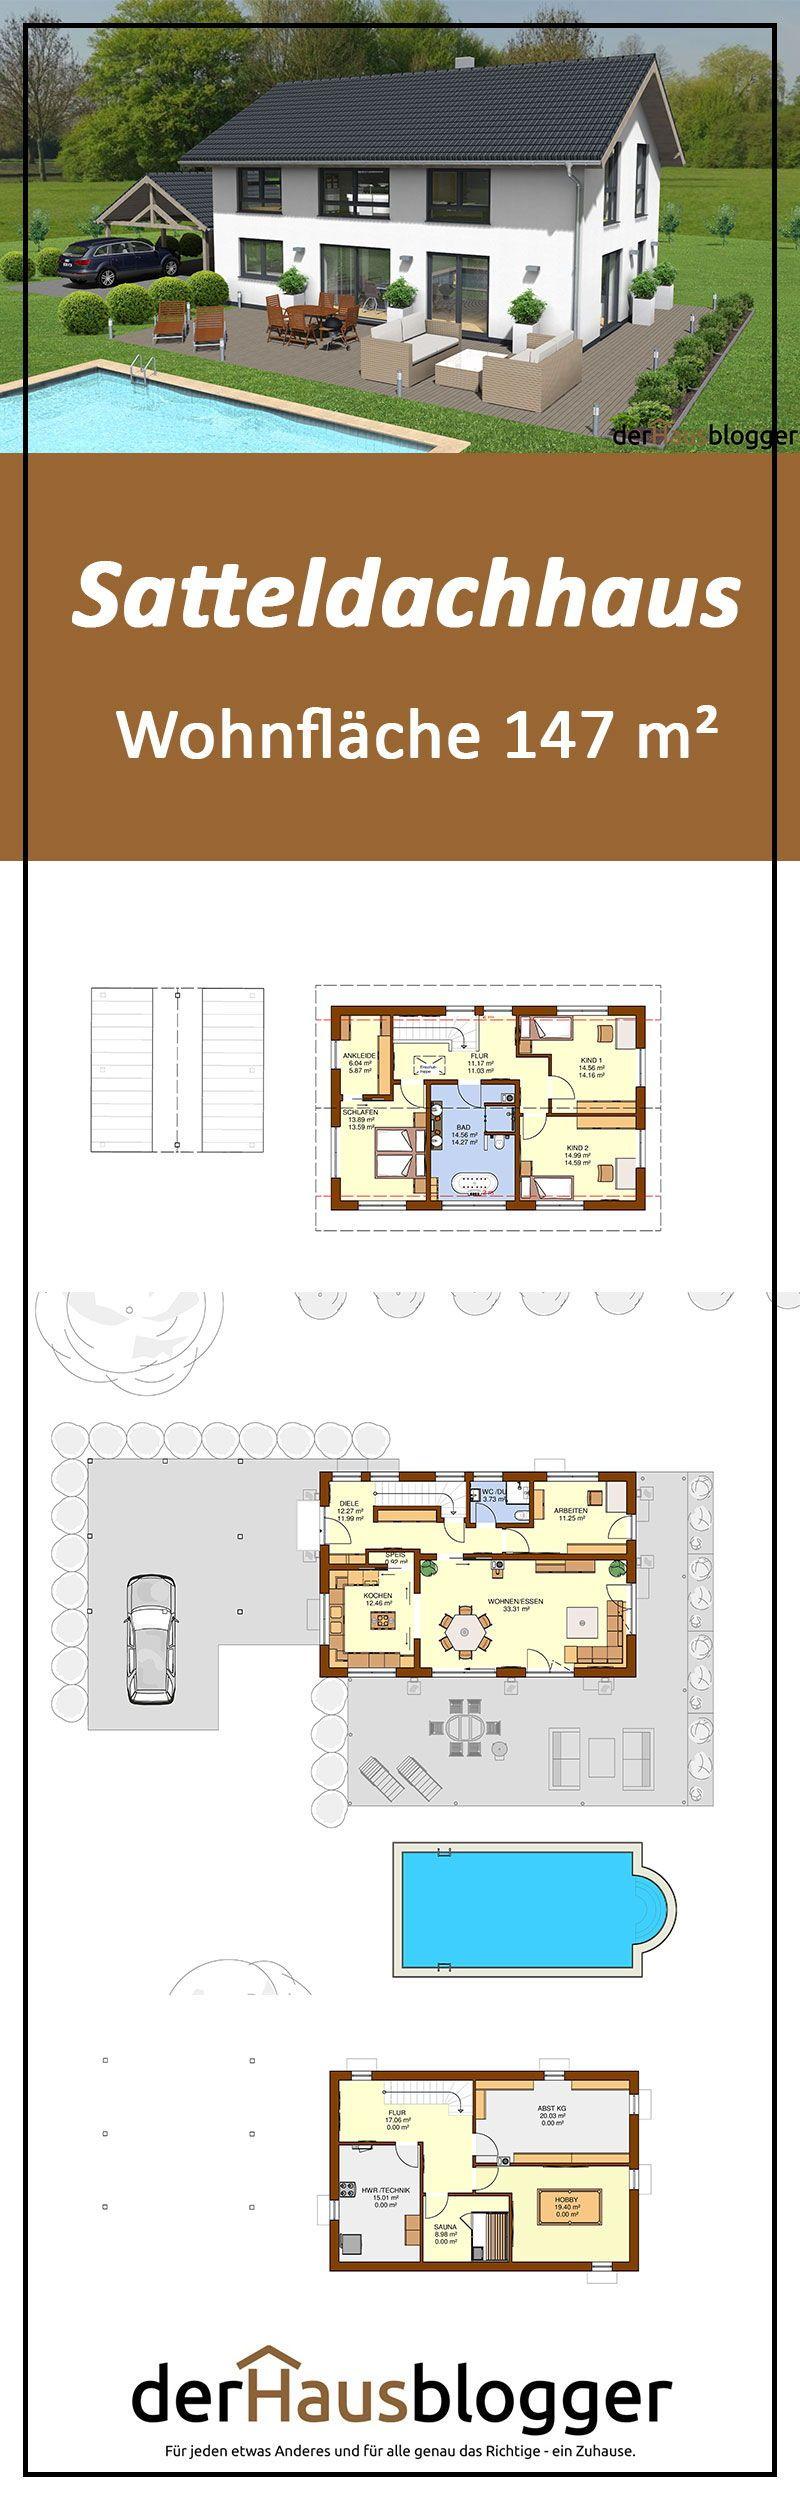 Photo of Satteldachhaus 147m² | derHausblogger